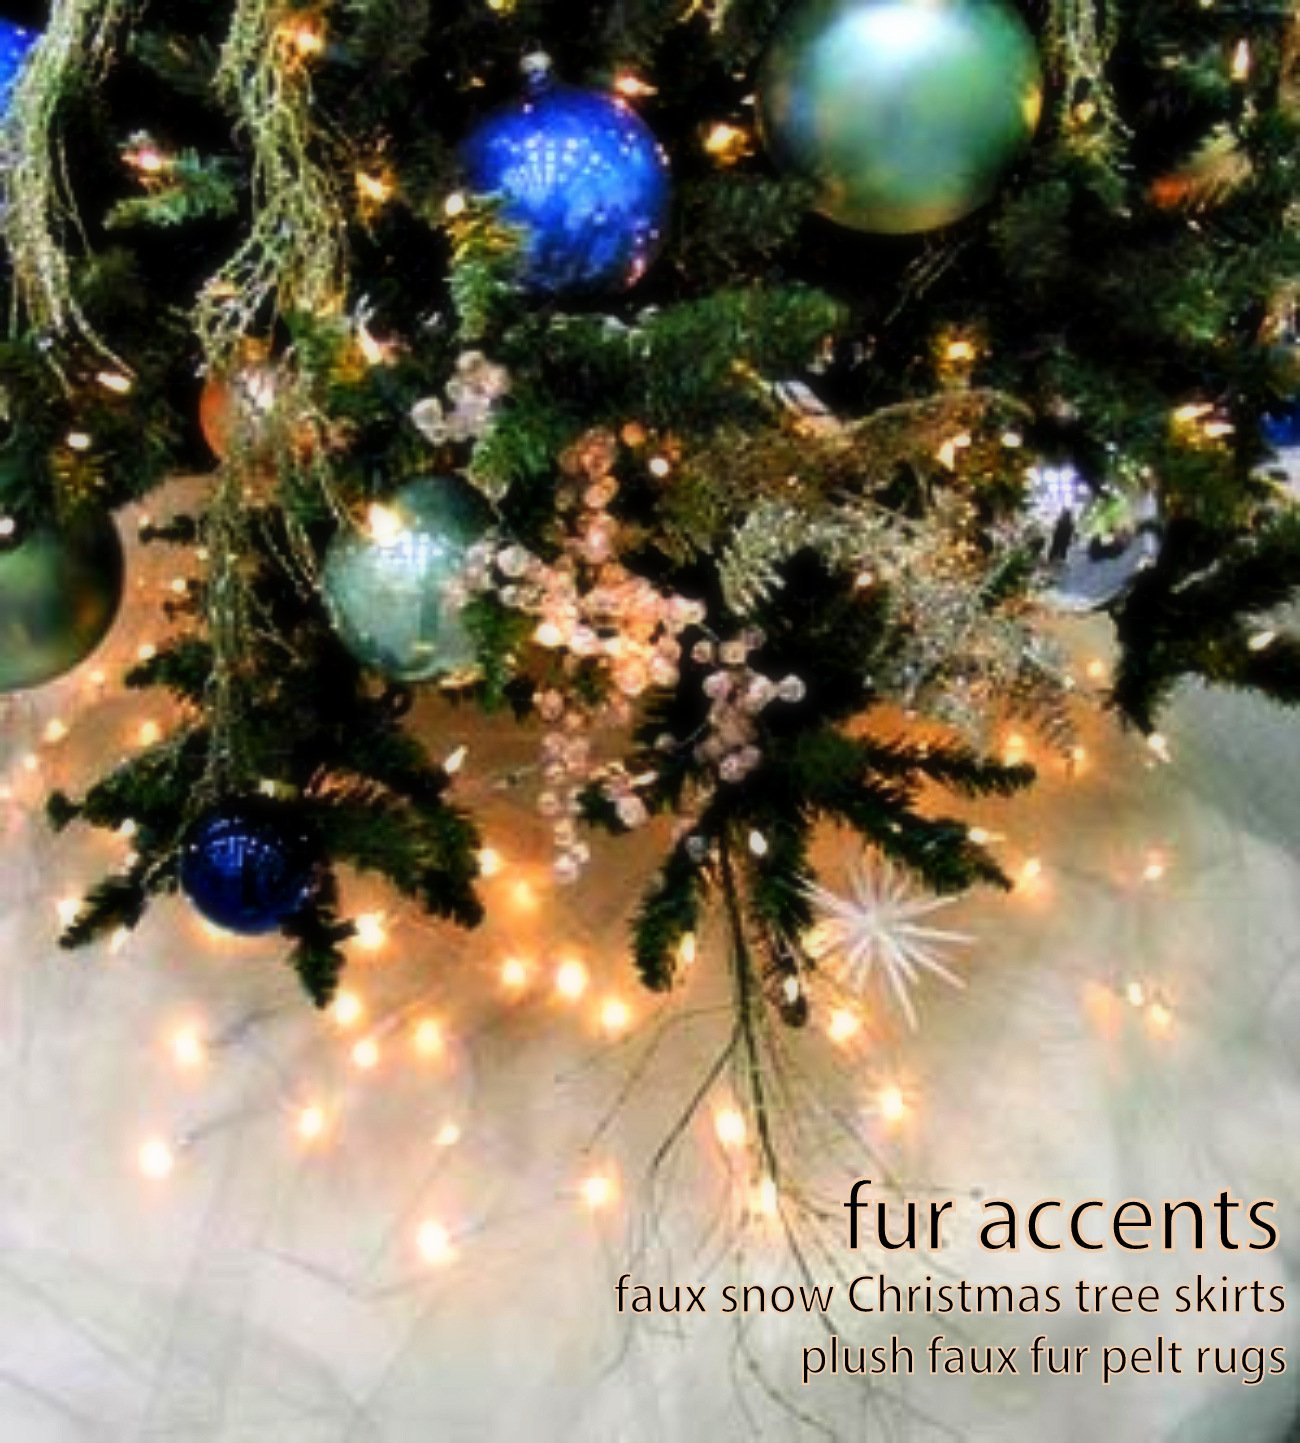 amazoncom fur accents christmas holiday tree skirt plush shaggy faux fur snow white 30 diameter home kitchen - White Christmas Tree Skirt